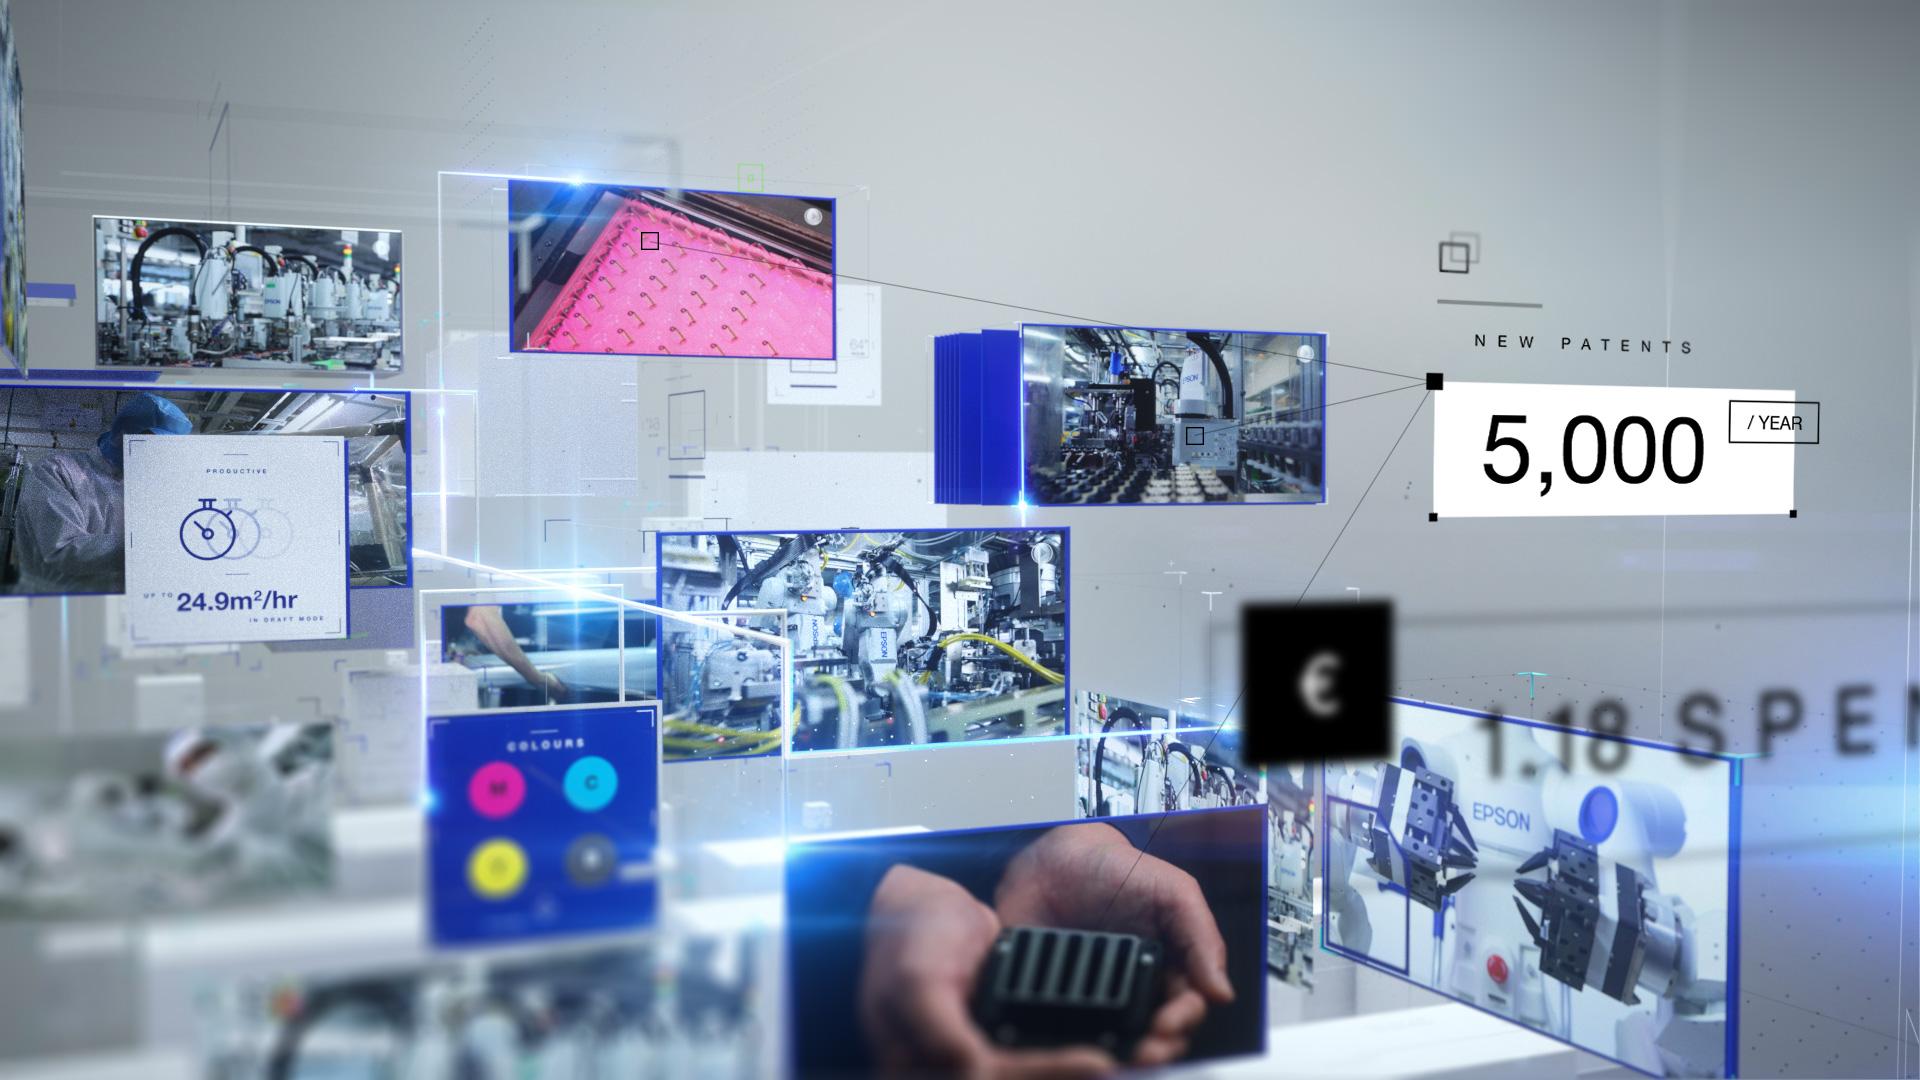 epson-corpo-products-03-01.jpg